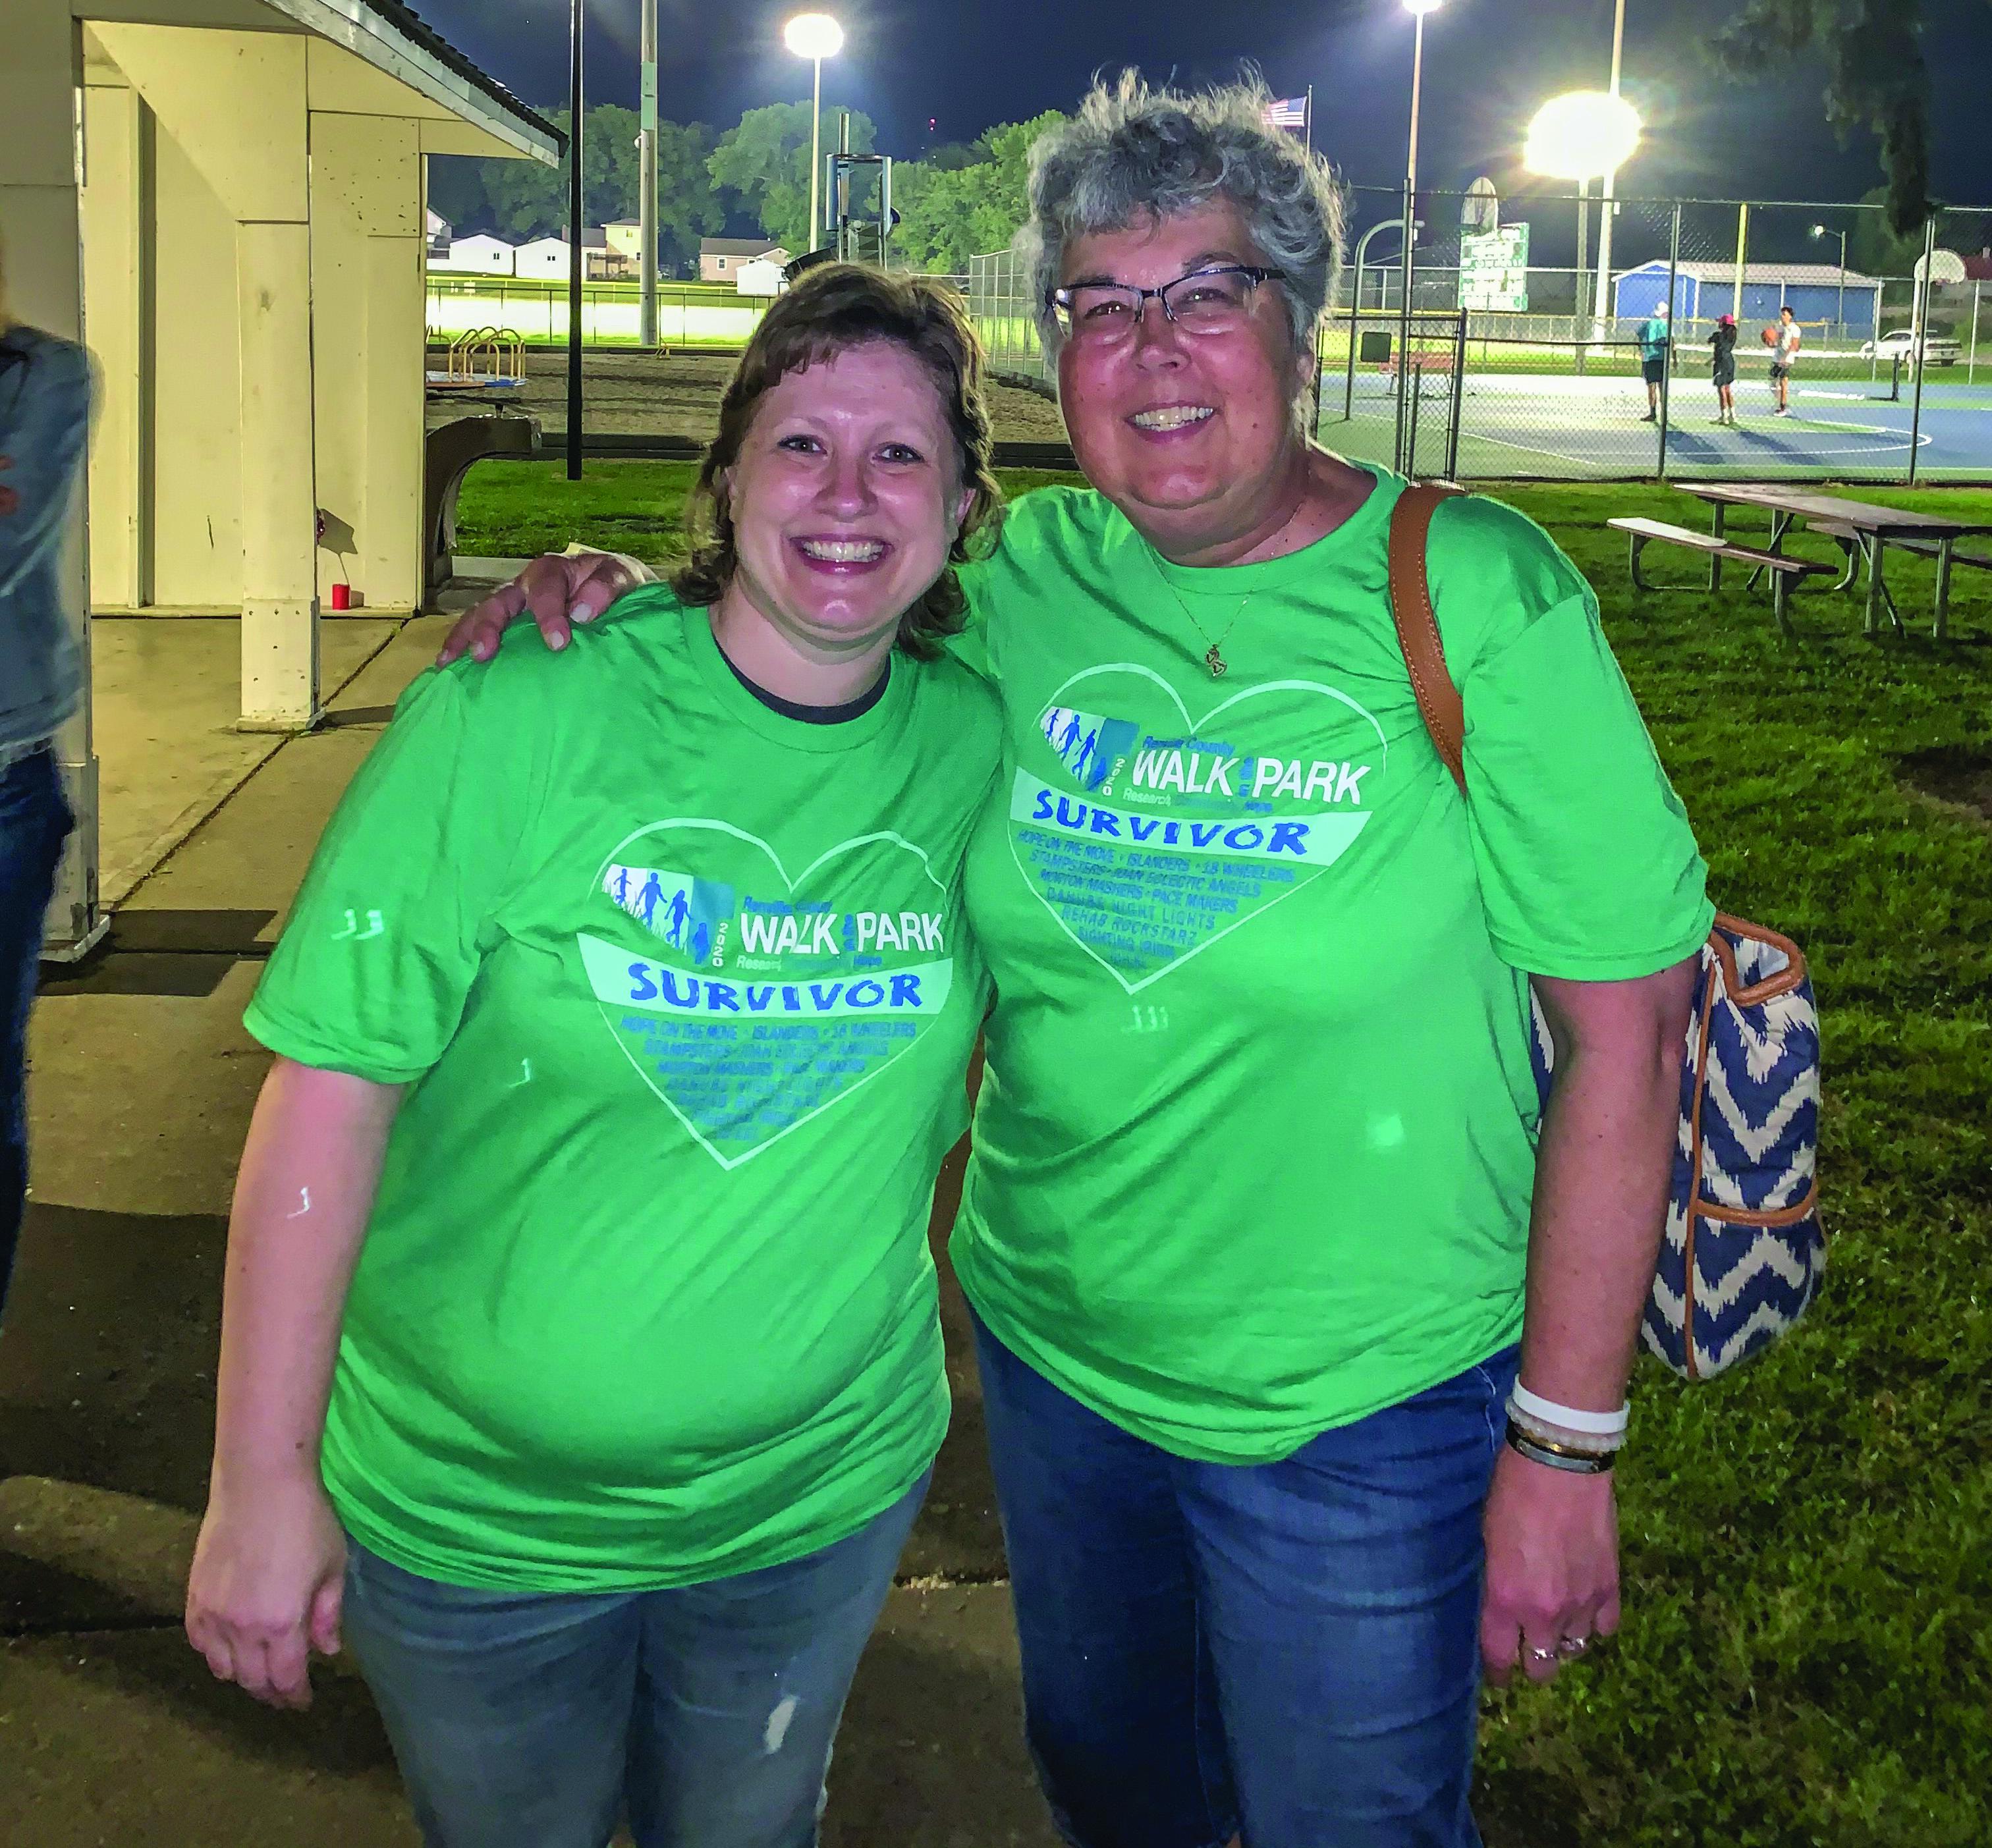 Survivors Kim Kaiser and Maria Cuff take a break from the walk for a photo.